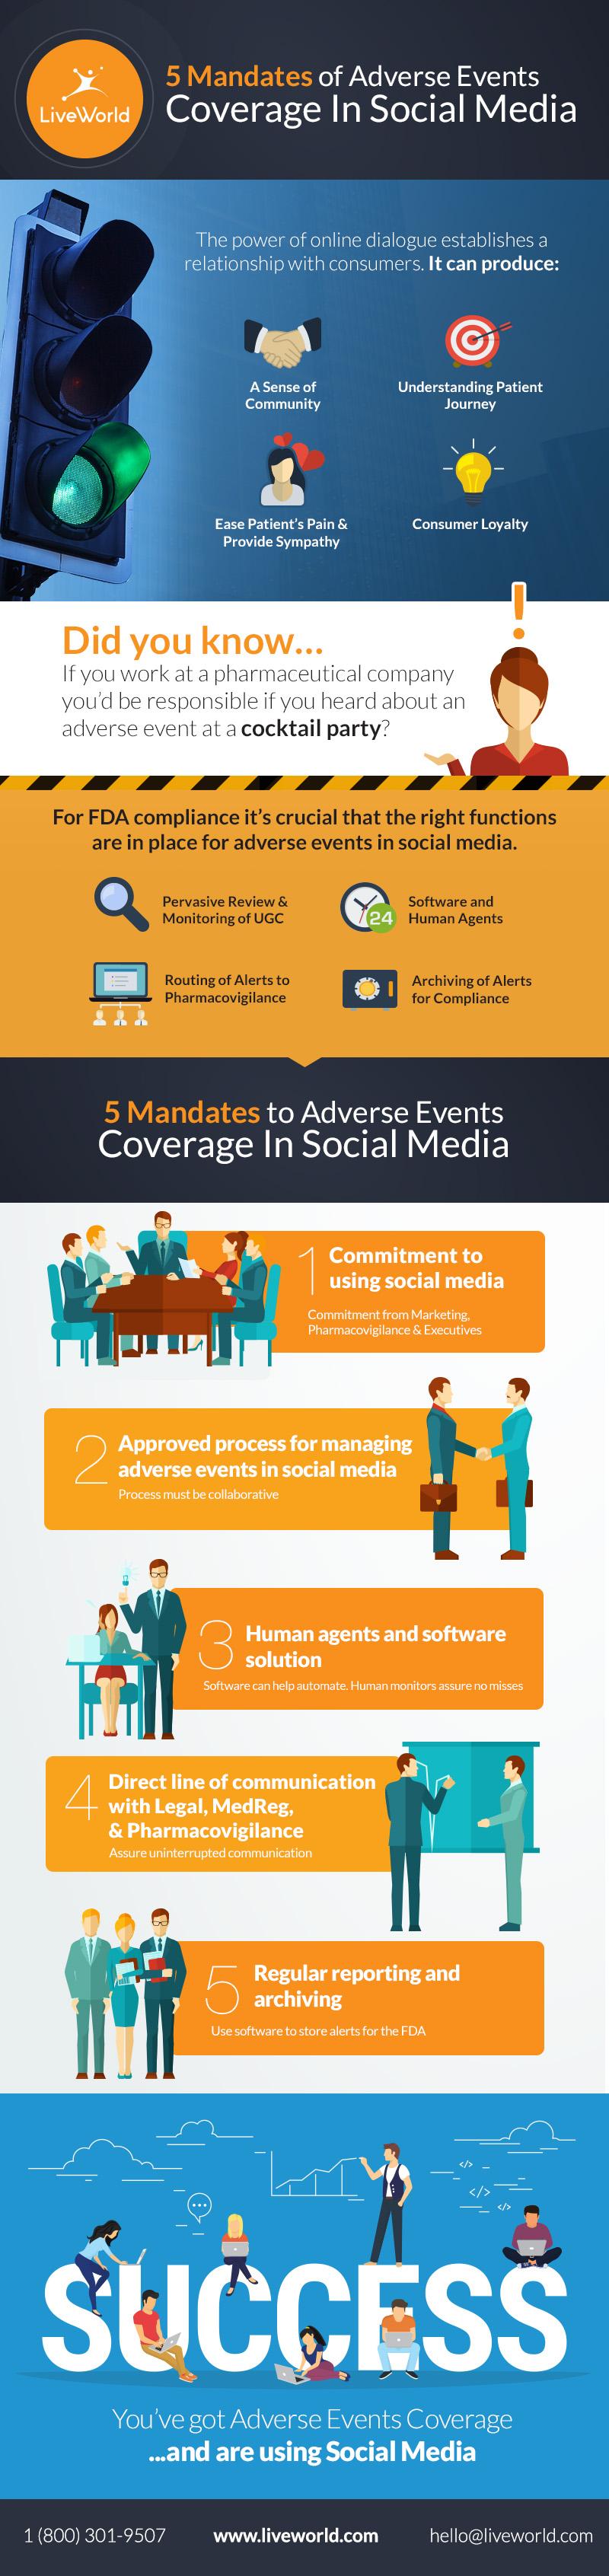 Managing Adverse Events in Social Media